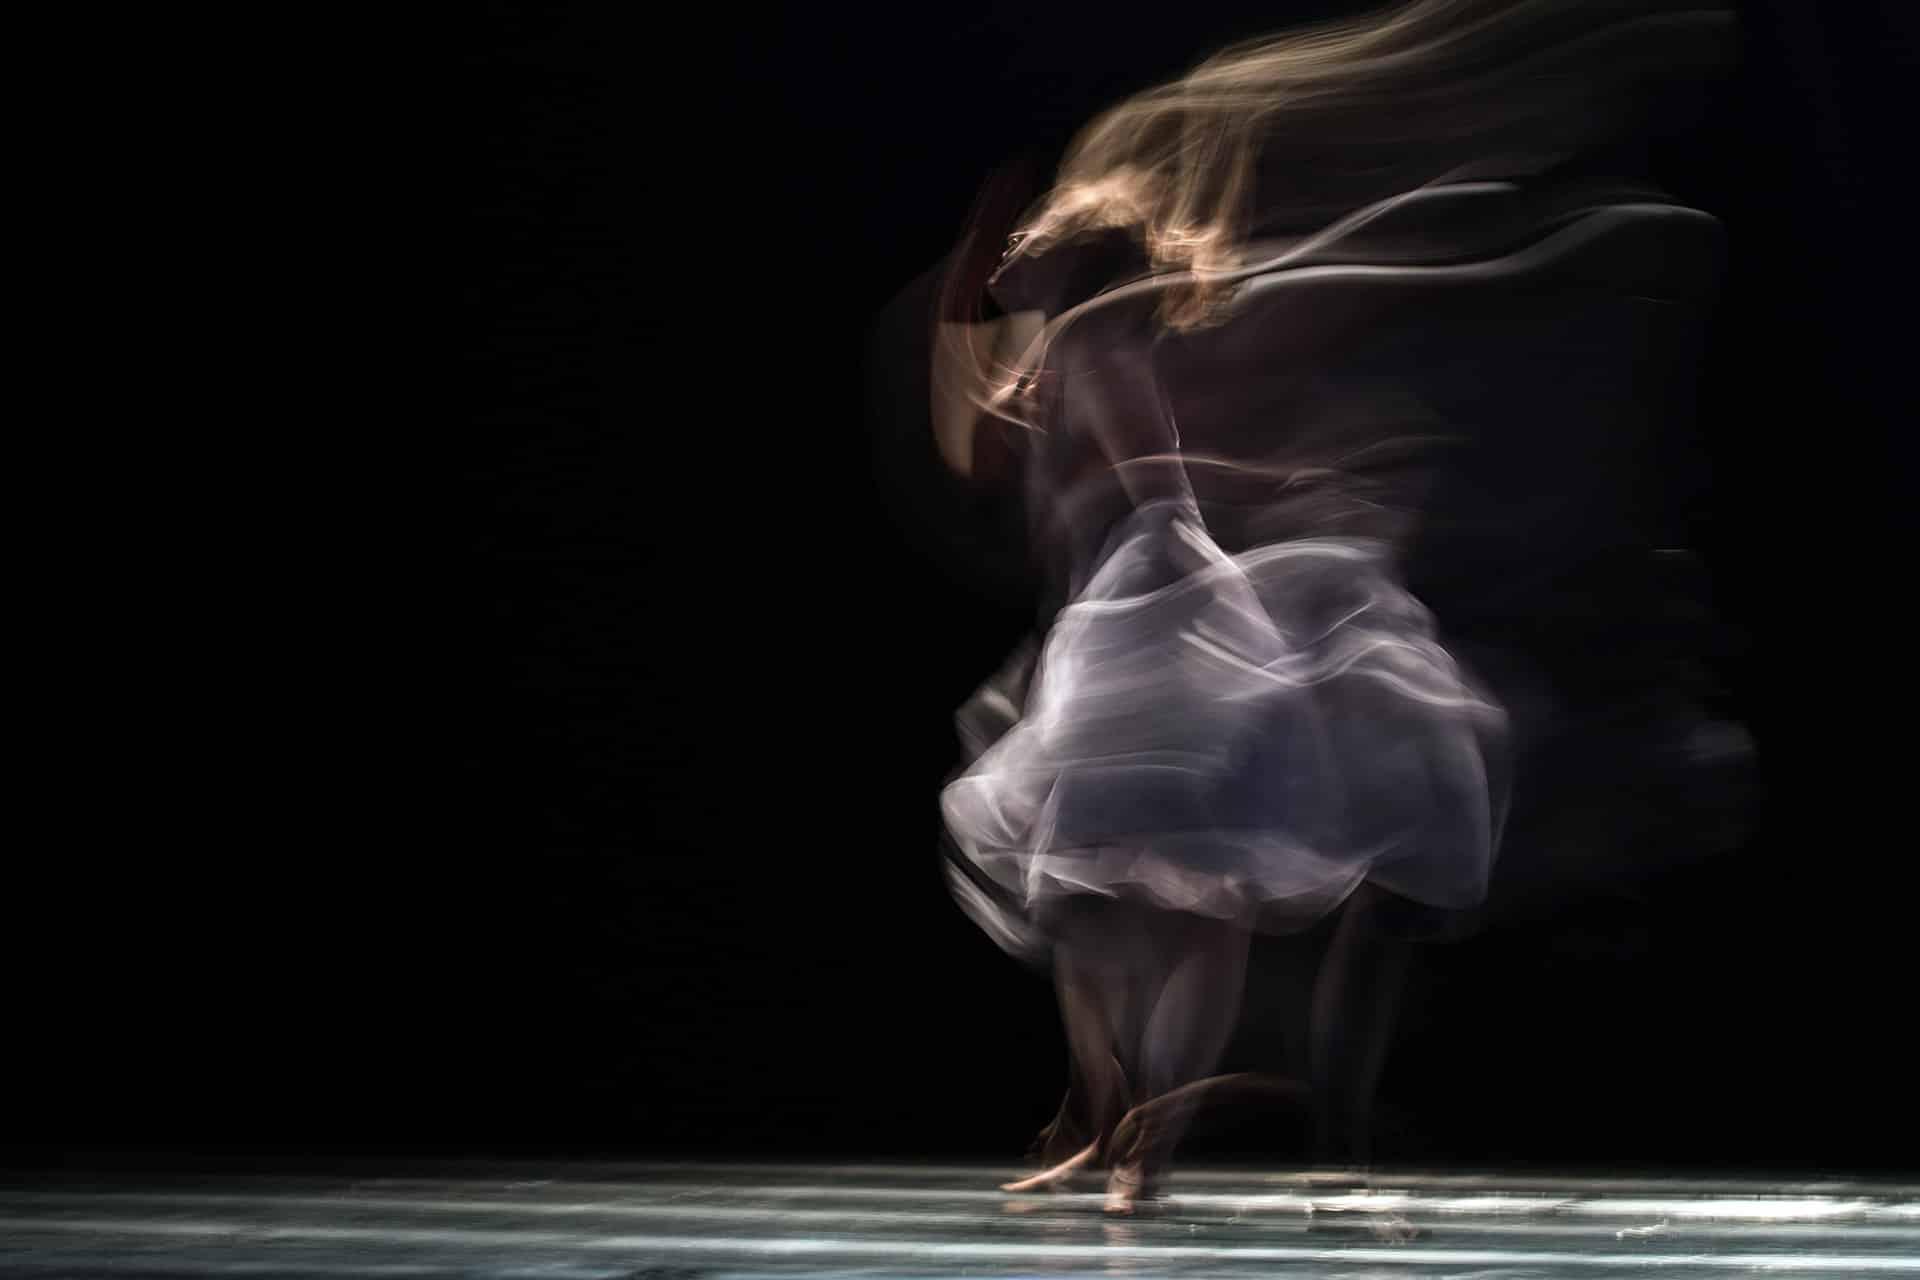 Image danseuse tourne vite siclem